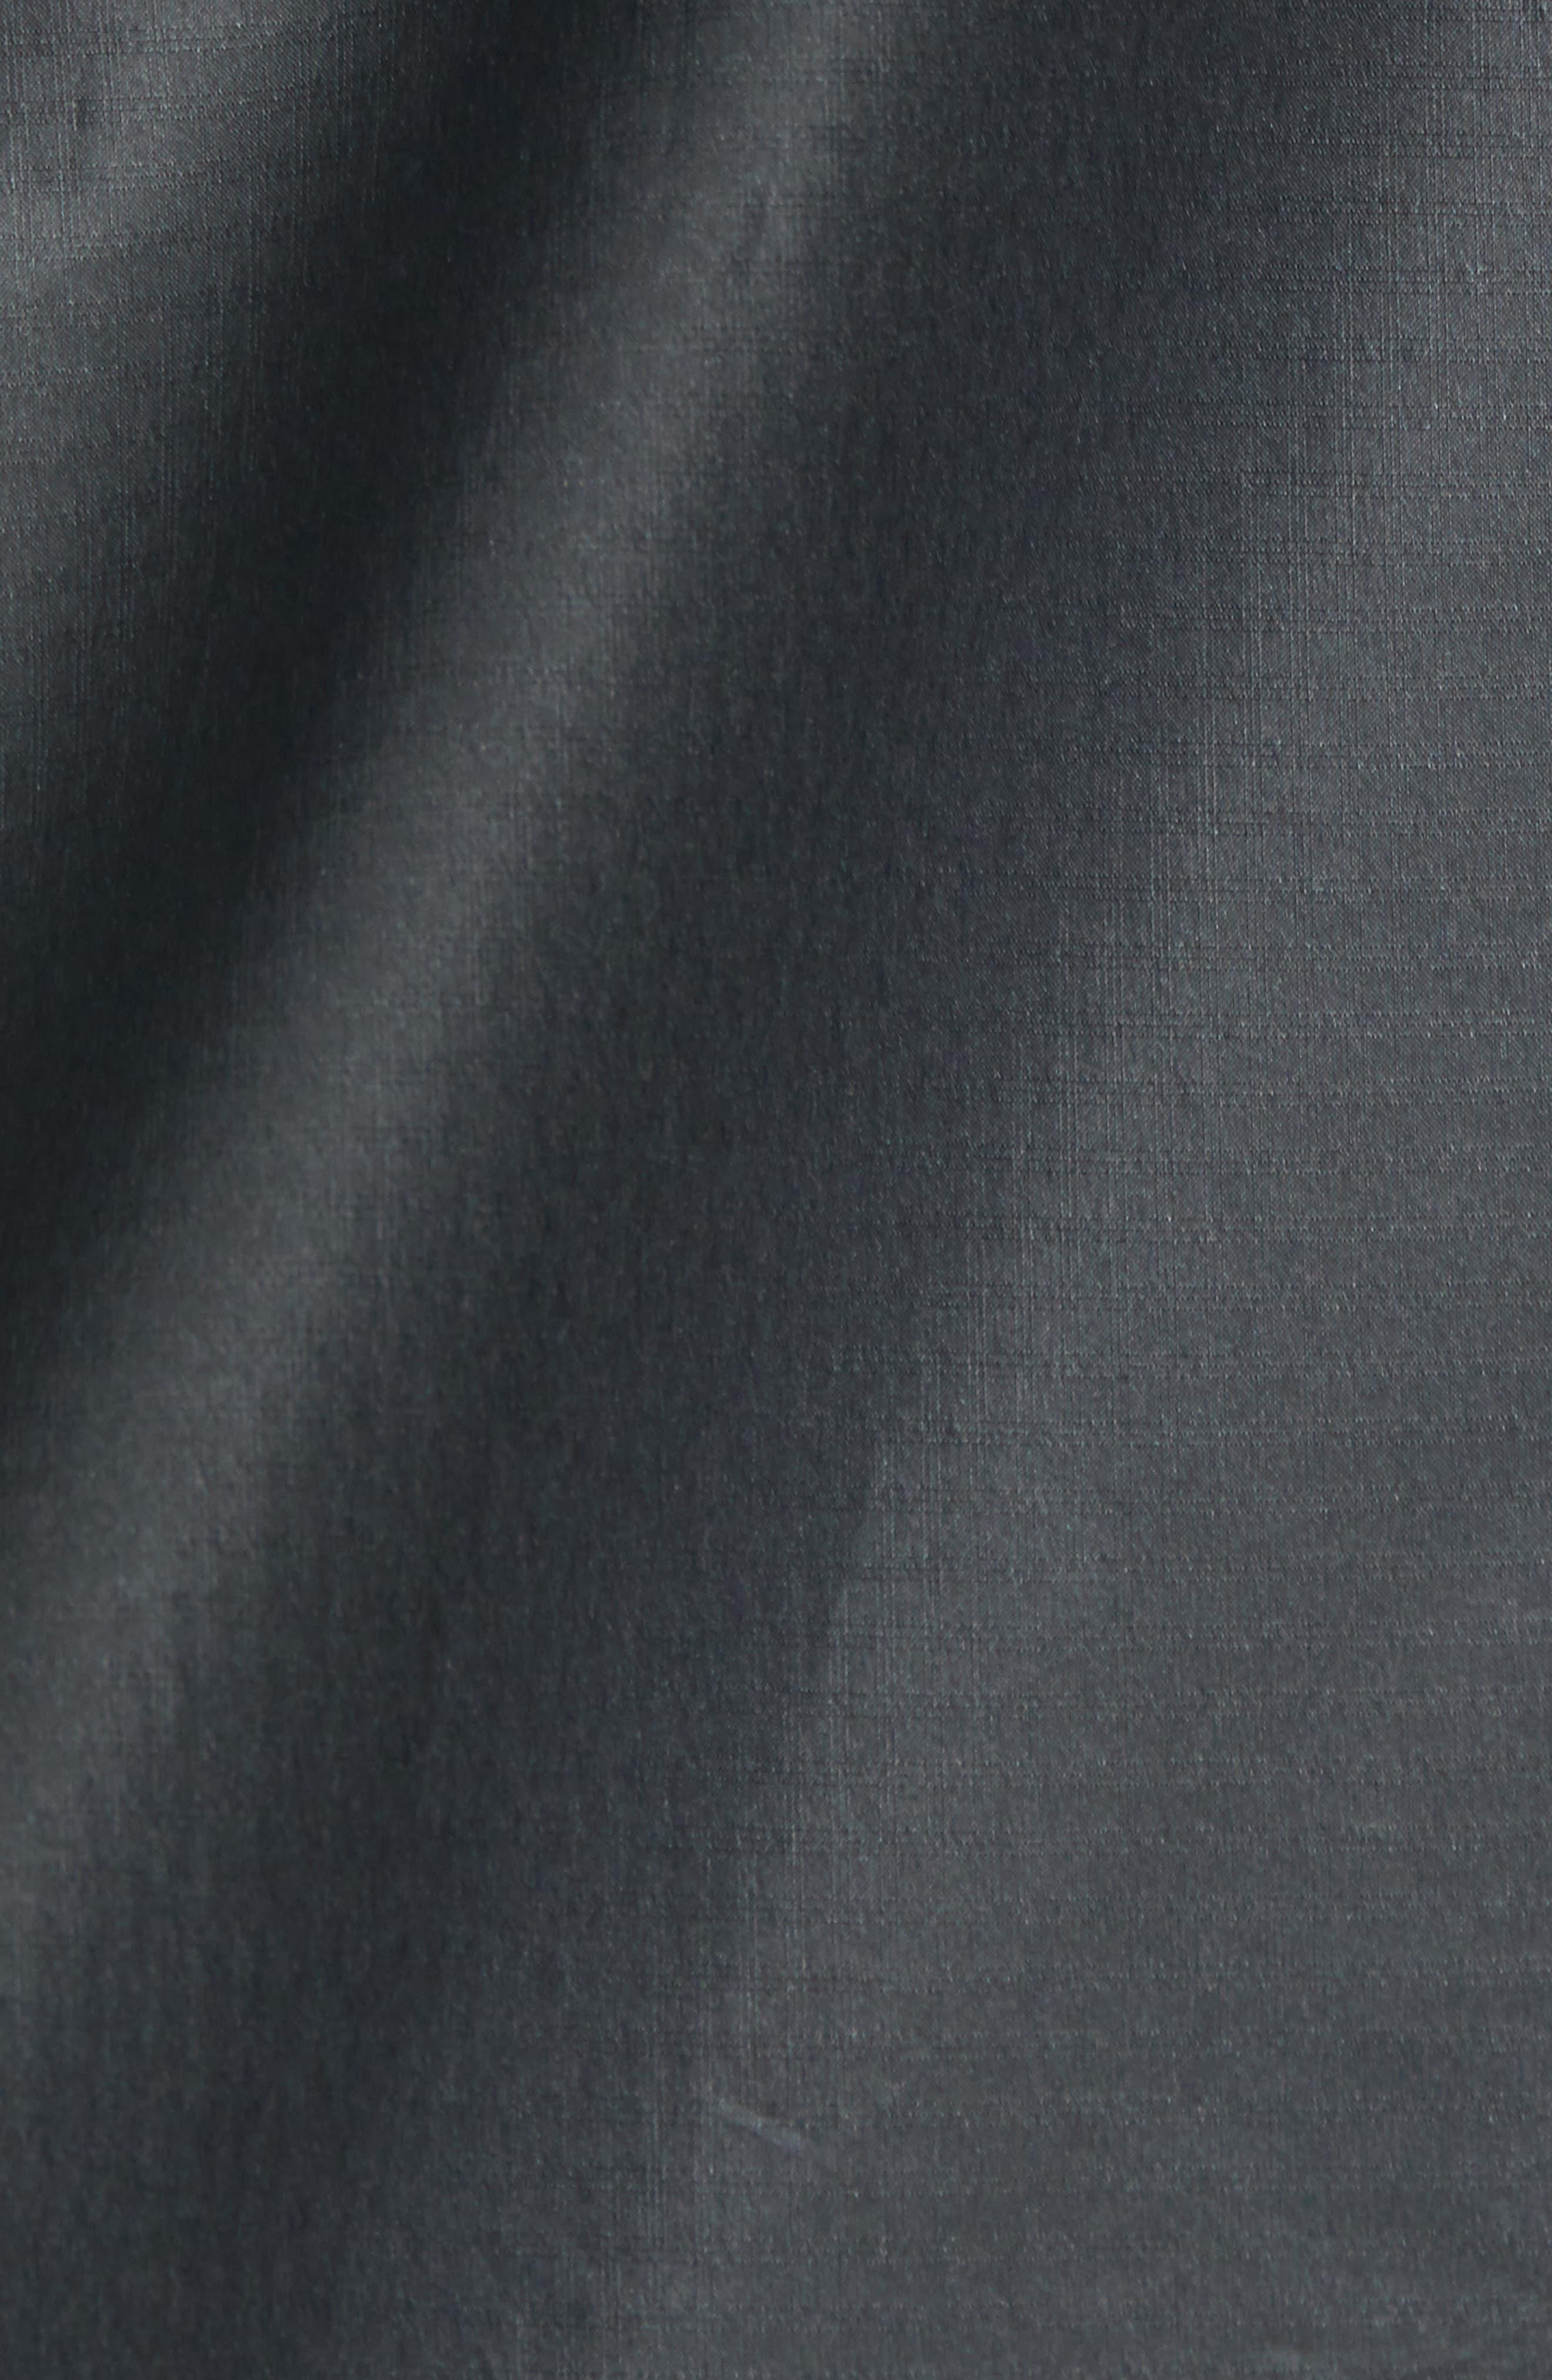 SB Anorak,                             Alternate thumbnail 5, color,                             Black/ Anthracite/ Black